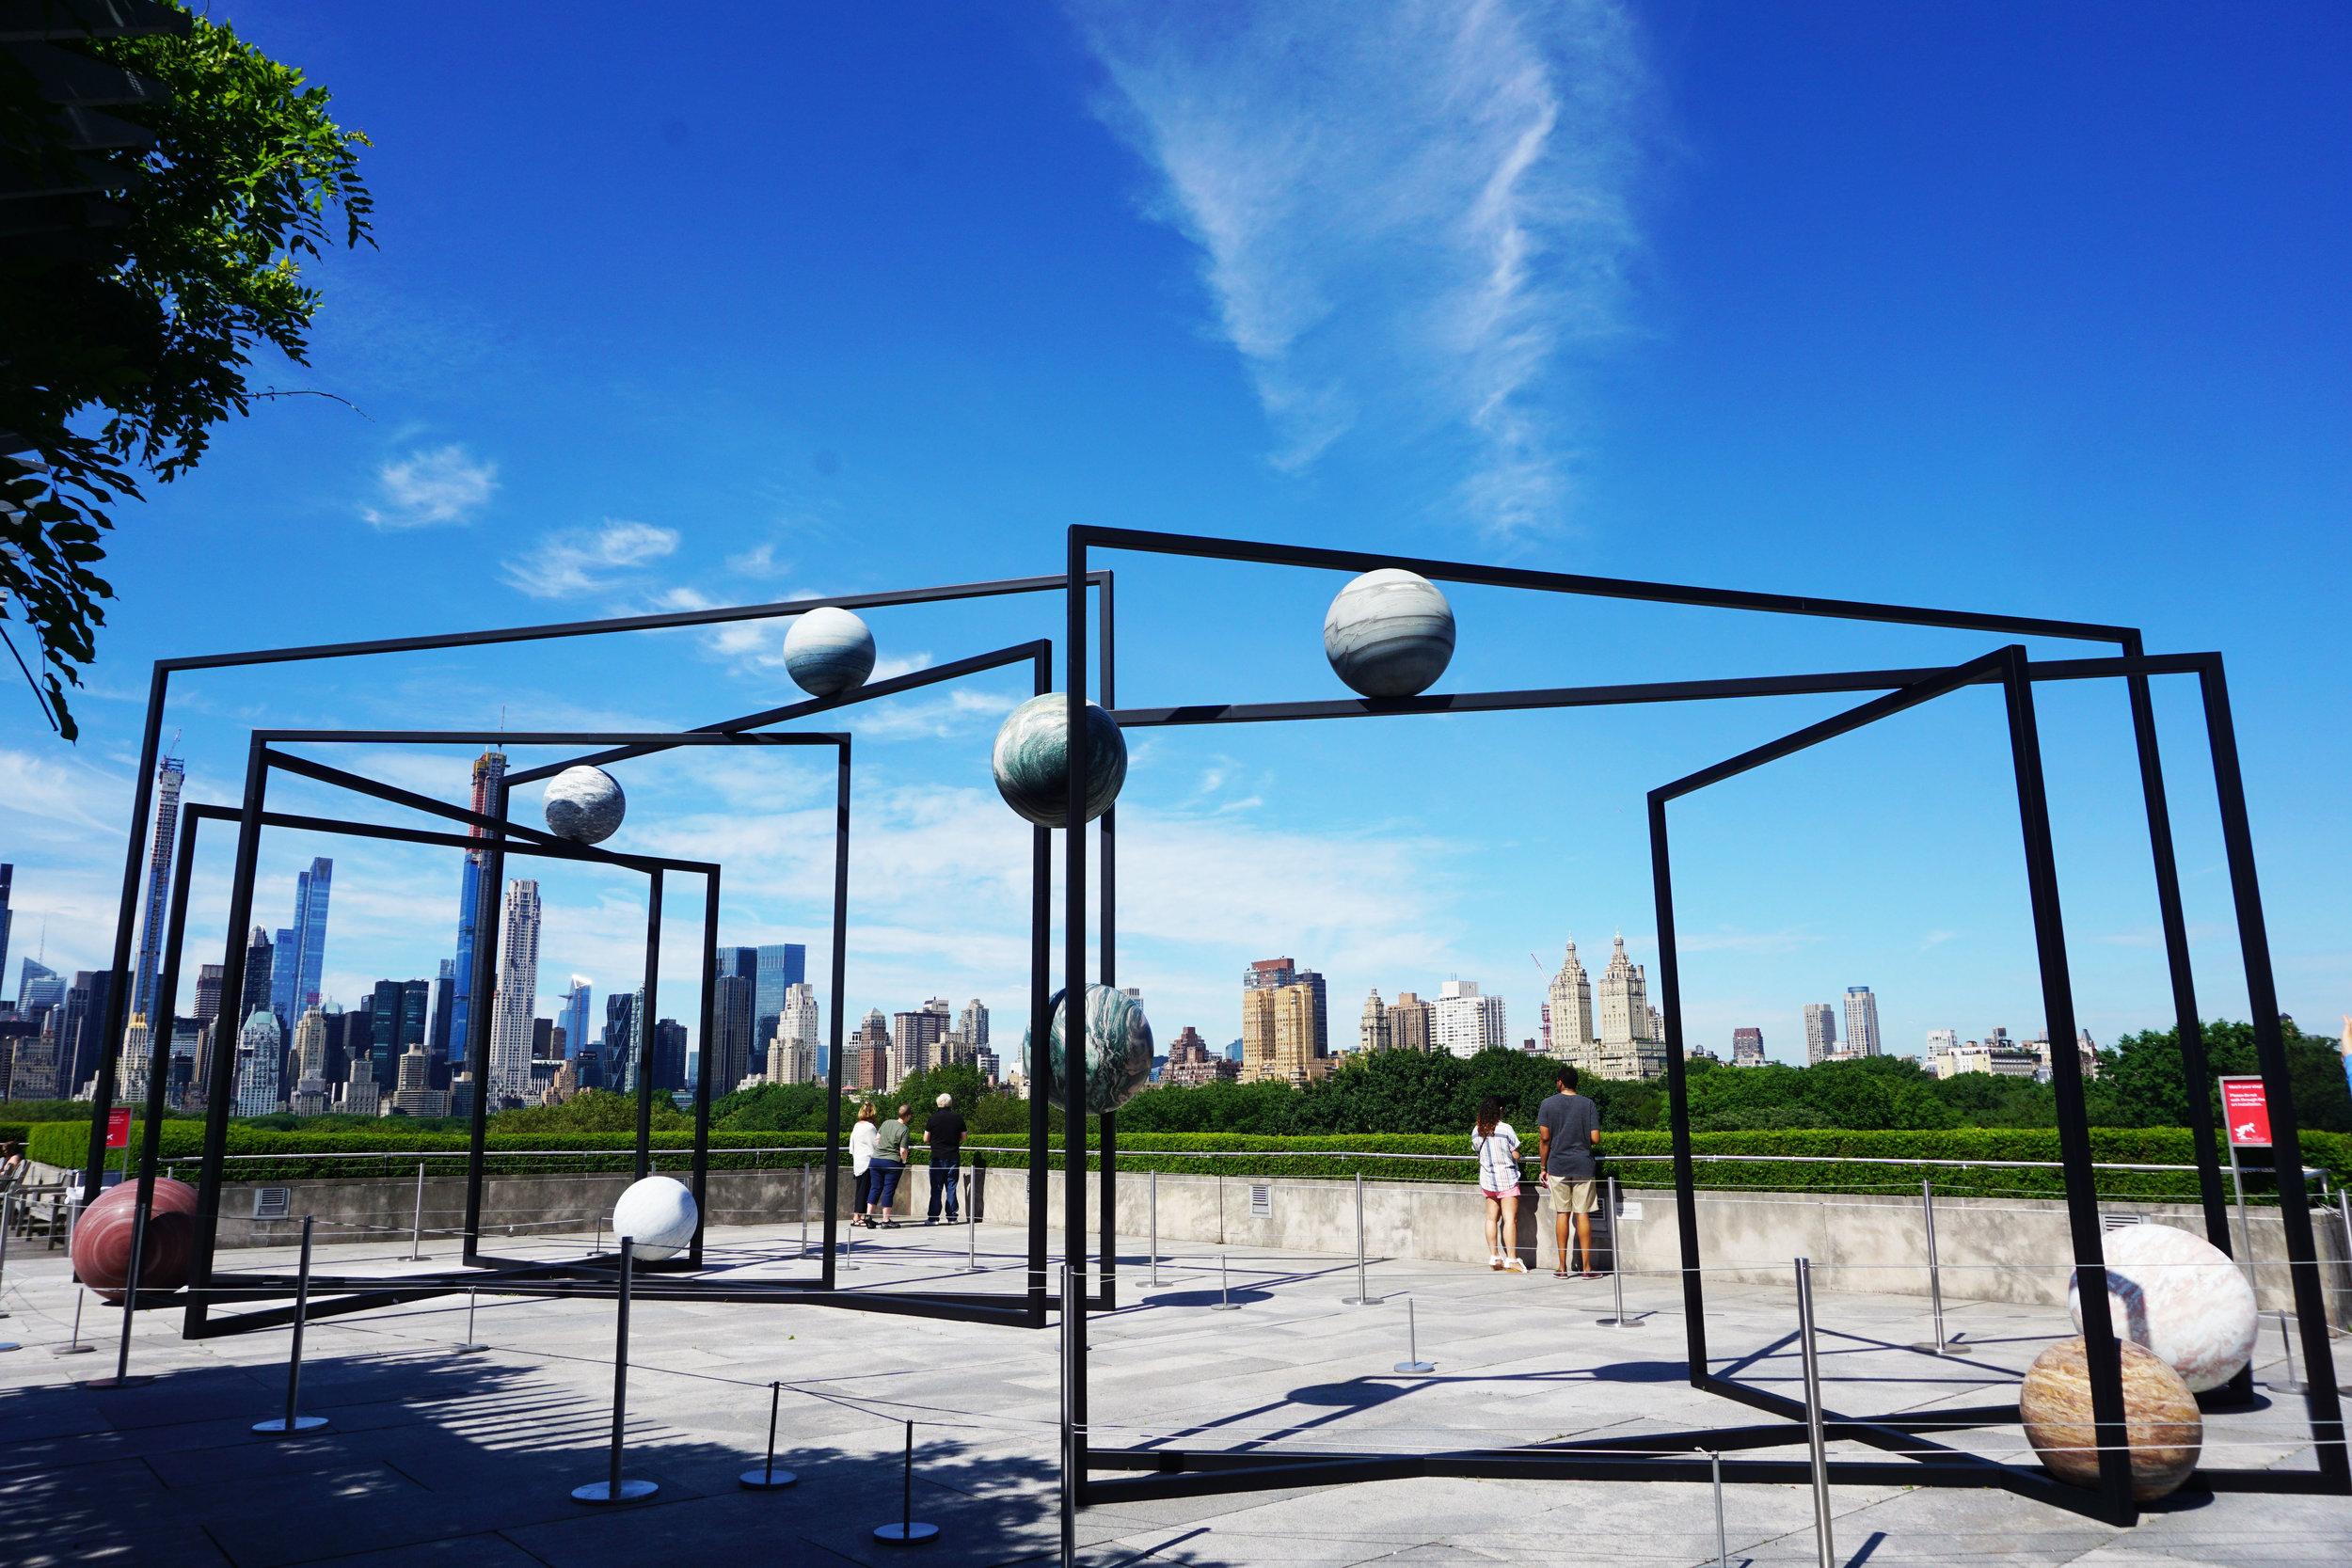 ParaPivot     by Alicija Kwade at The Met rooftop